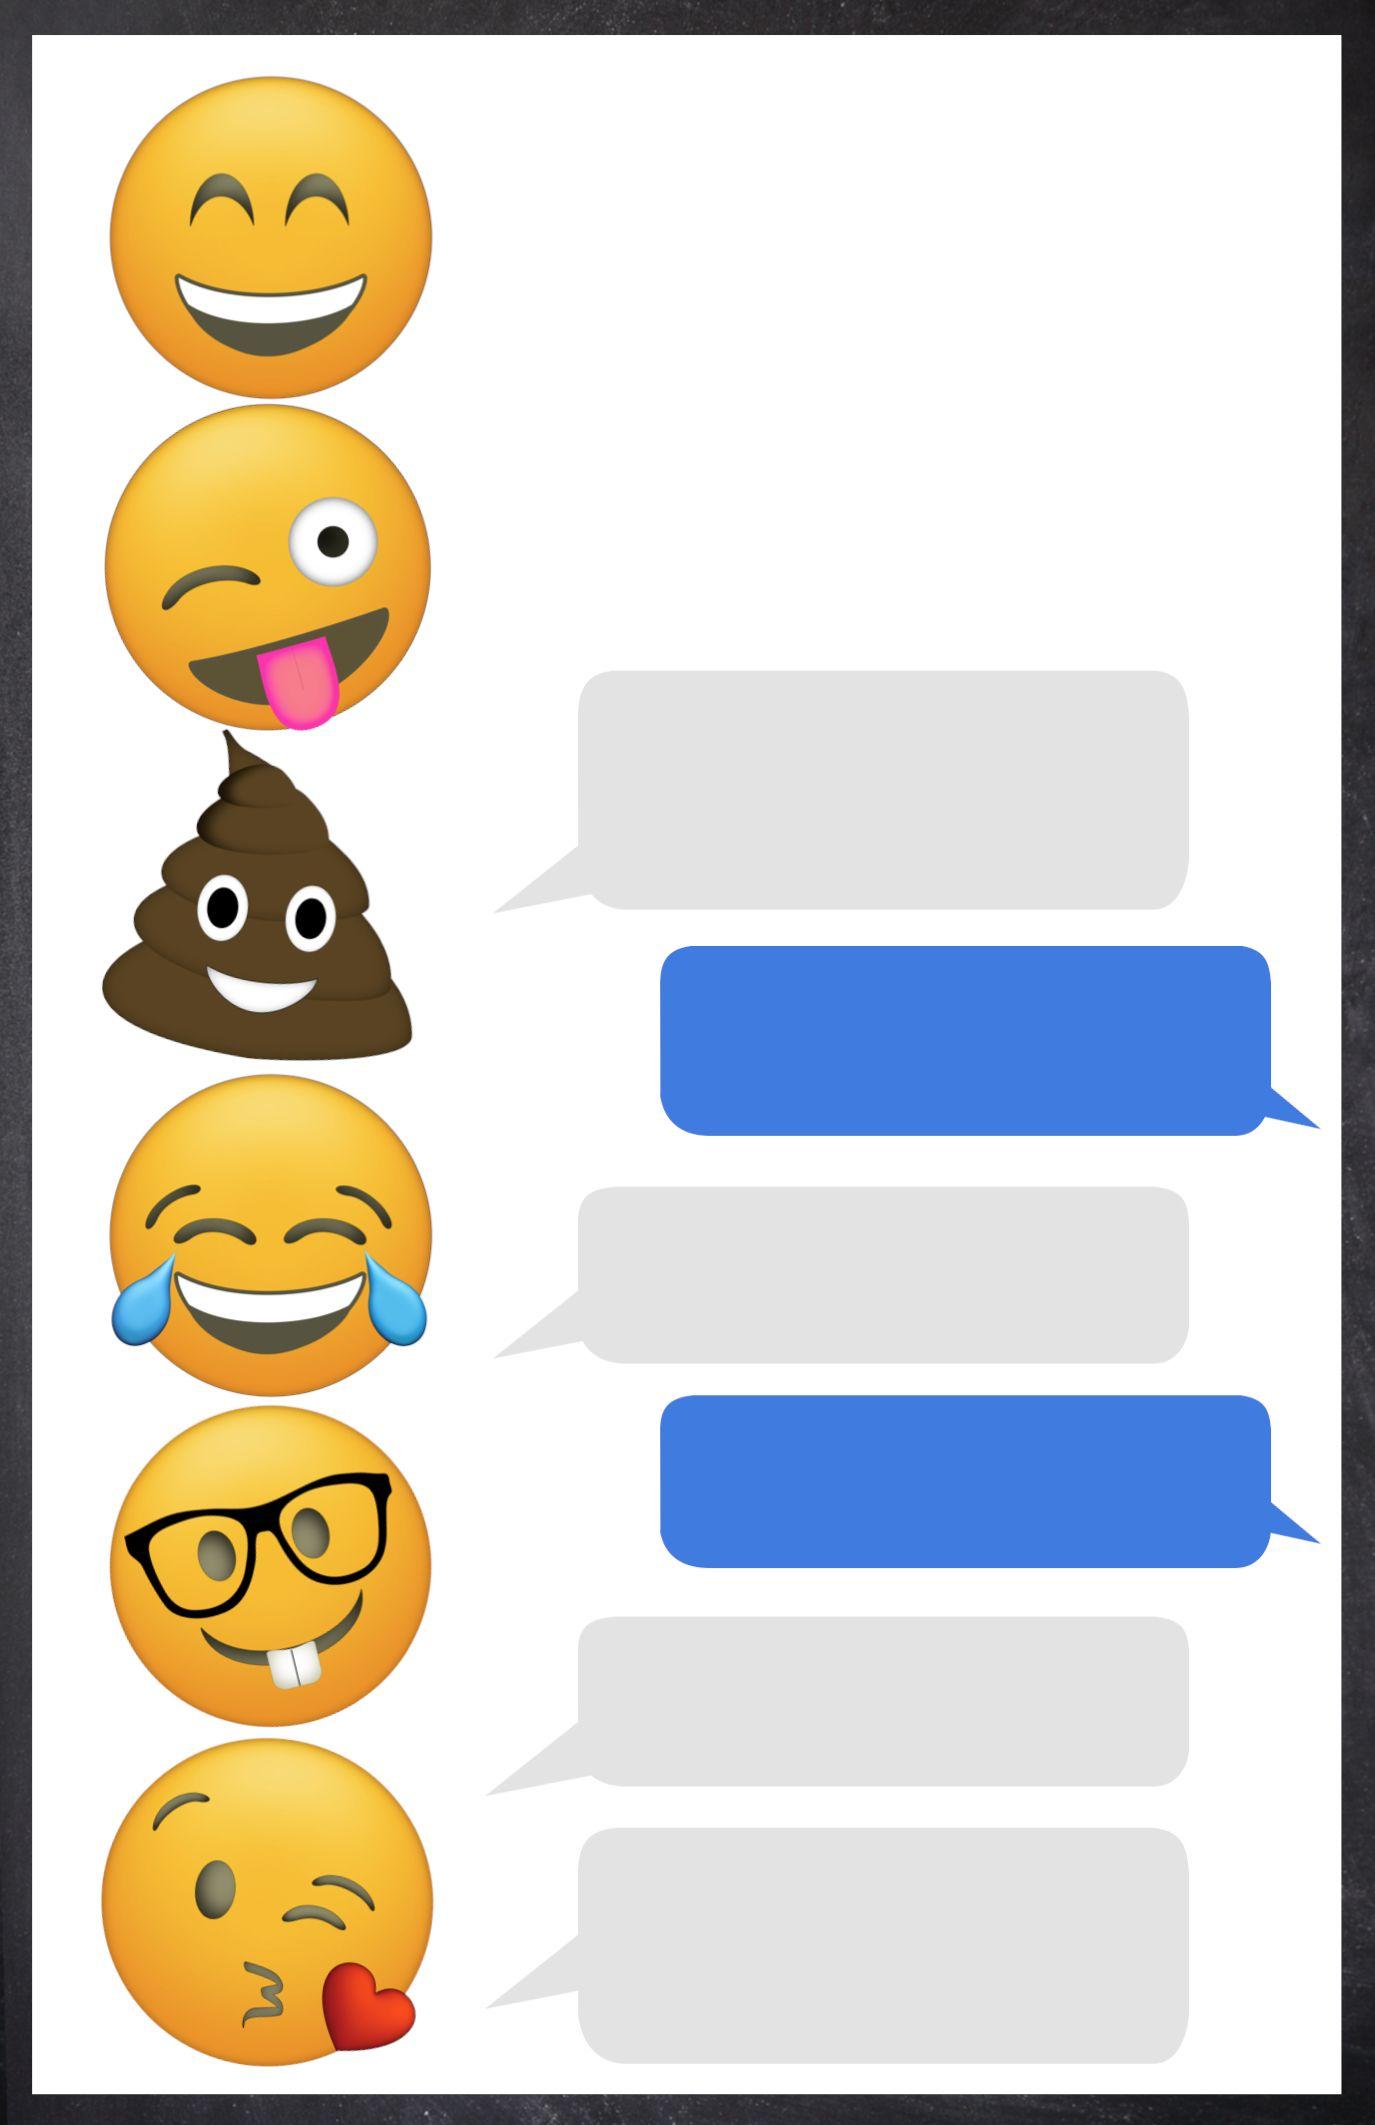 Pinjf And Company On Jorja's 8Th B-Day   Emoji Invitations - Emoji Invitations Printable Free